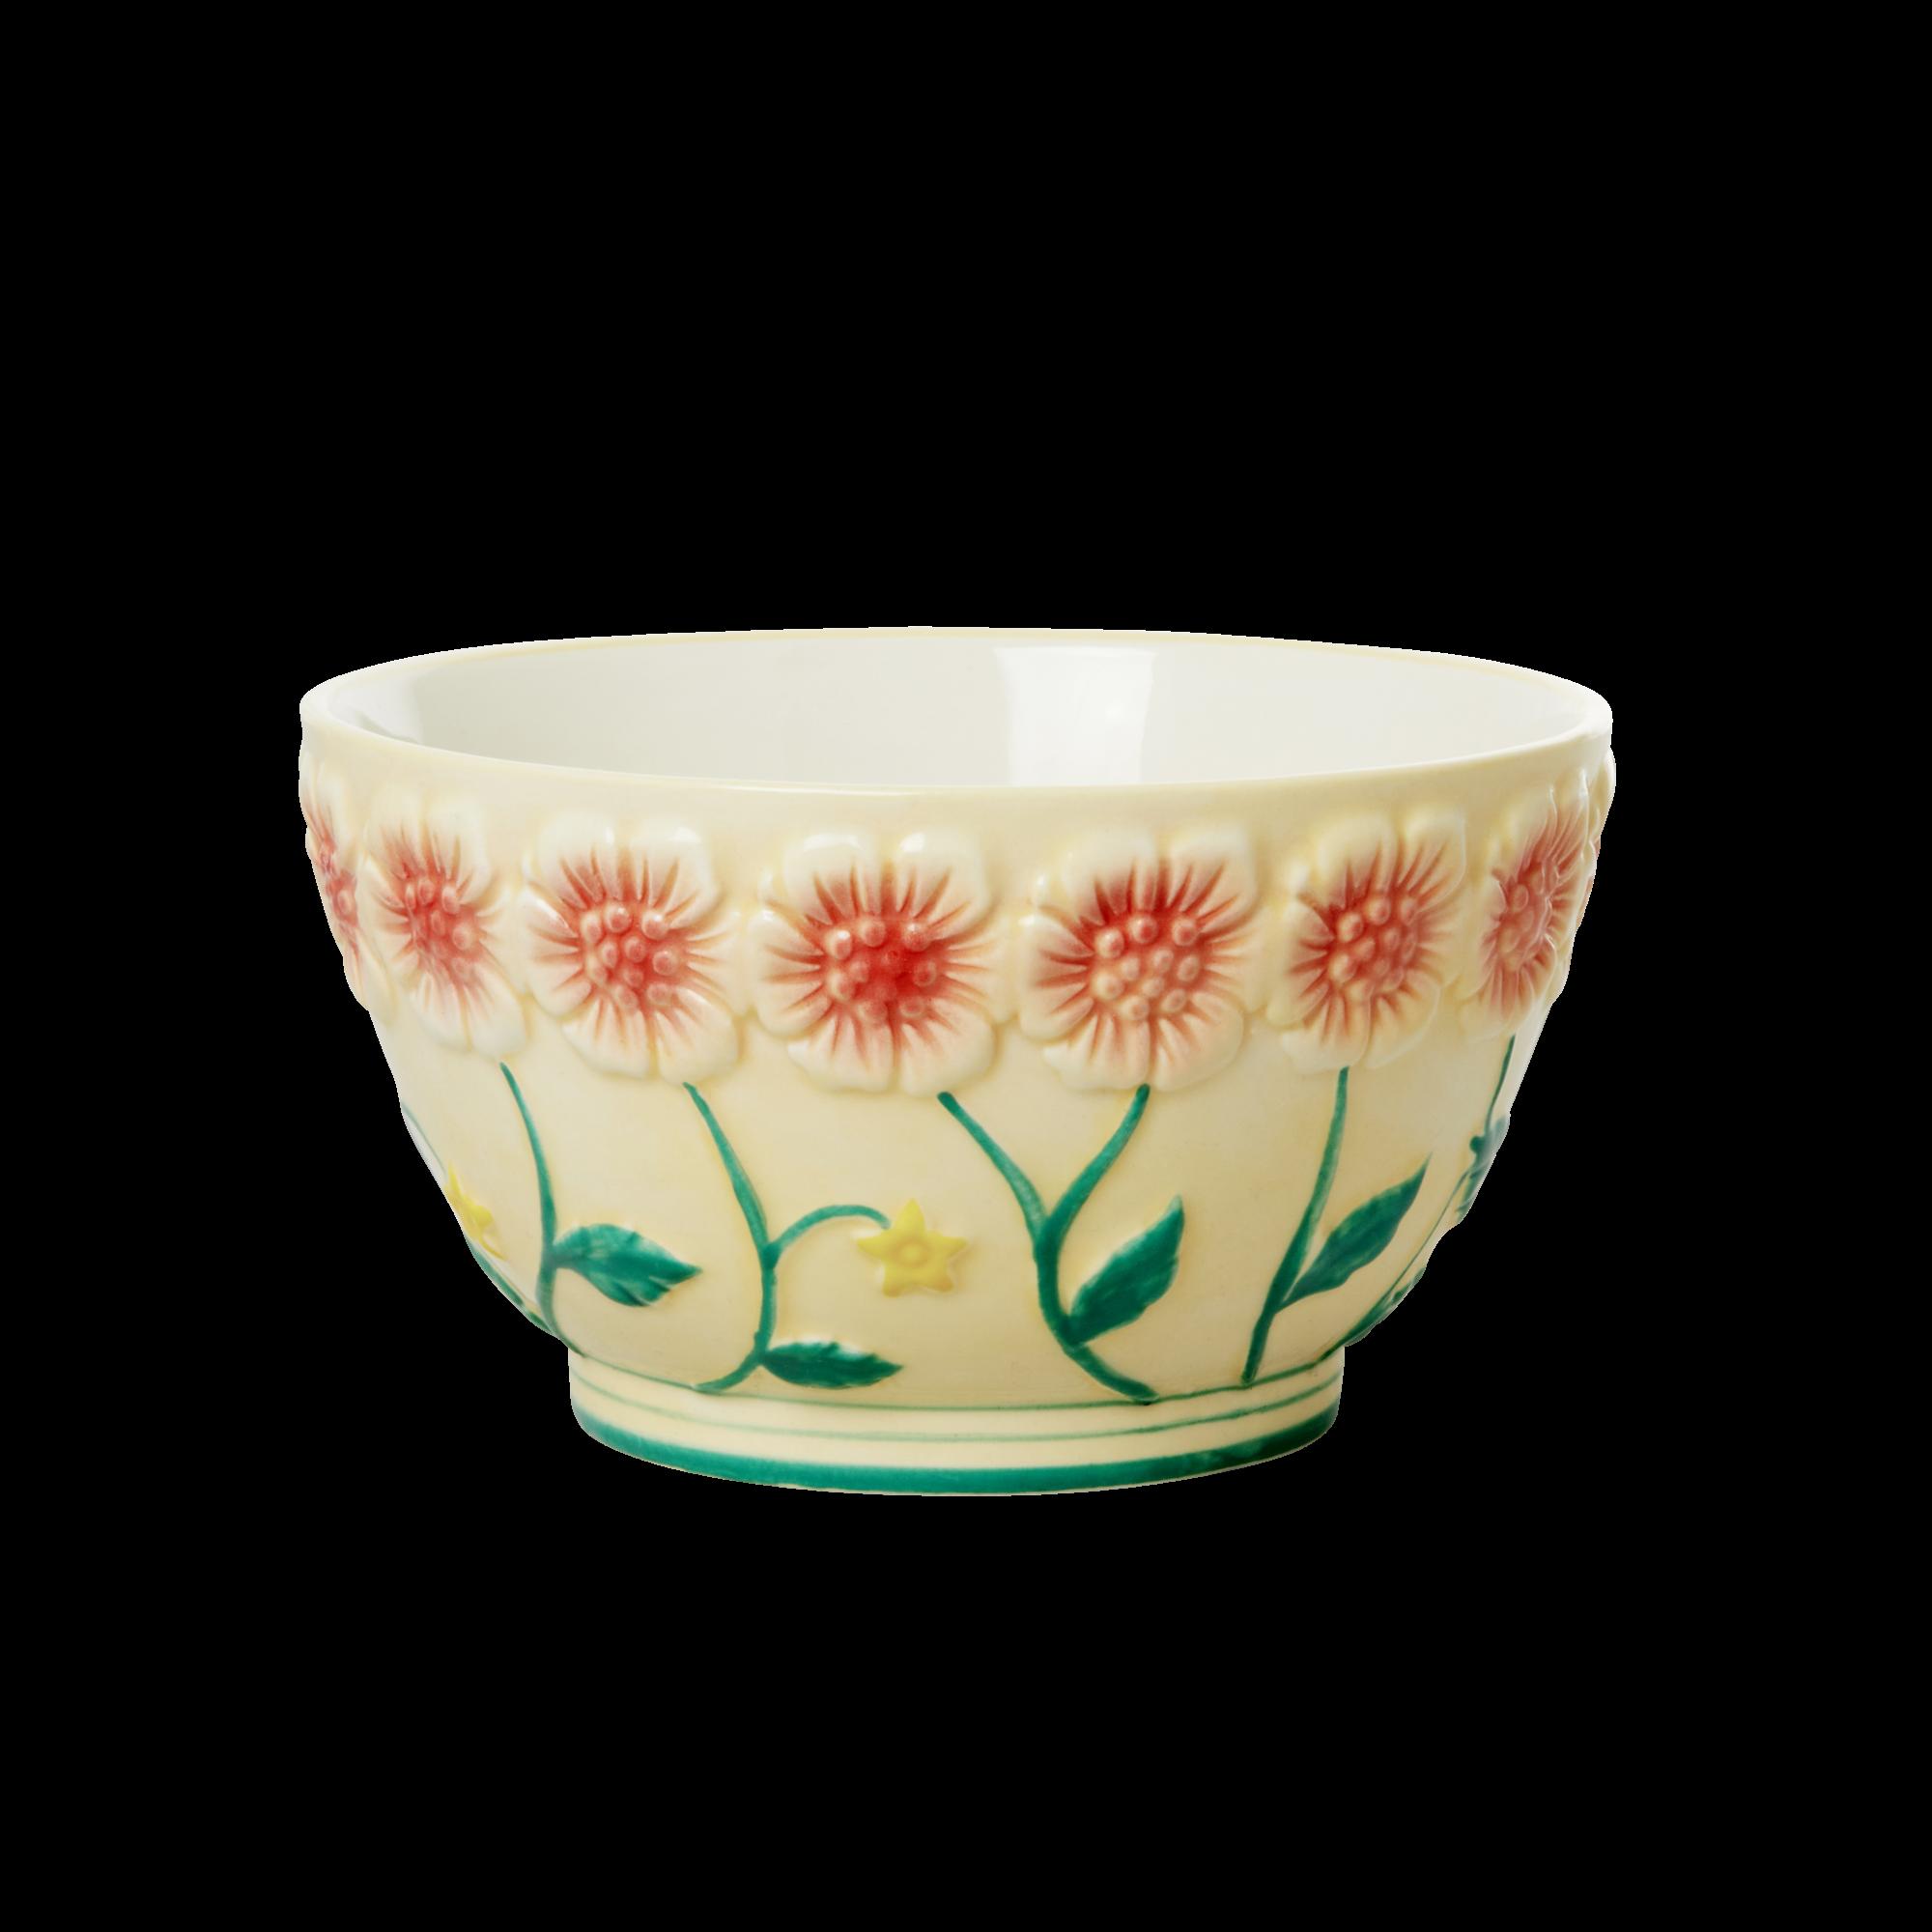 Rice - Ceramic Bowl with Embossed Flower Design - Creme